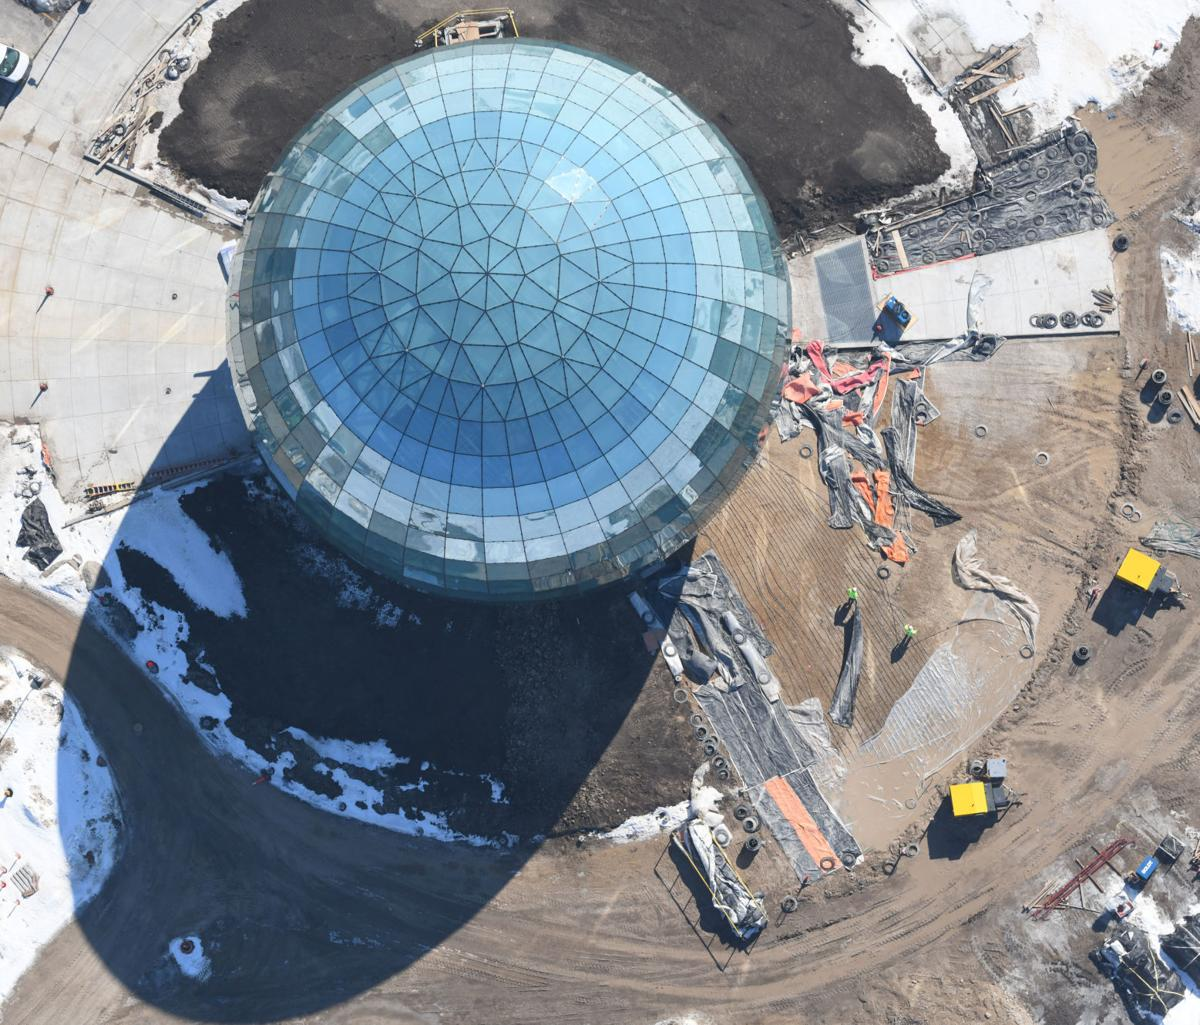 Foxconn High-Performance Computing Data Center Globe